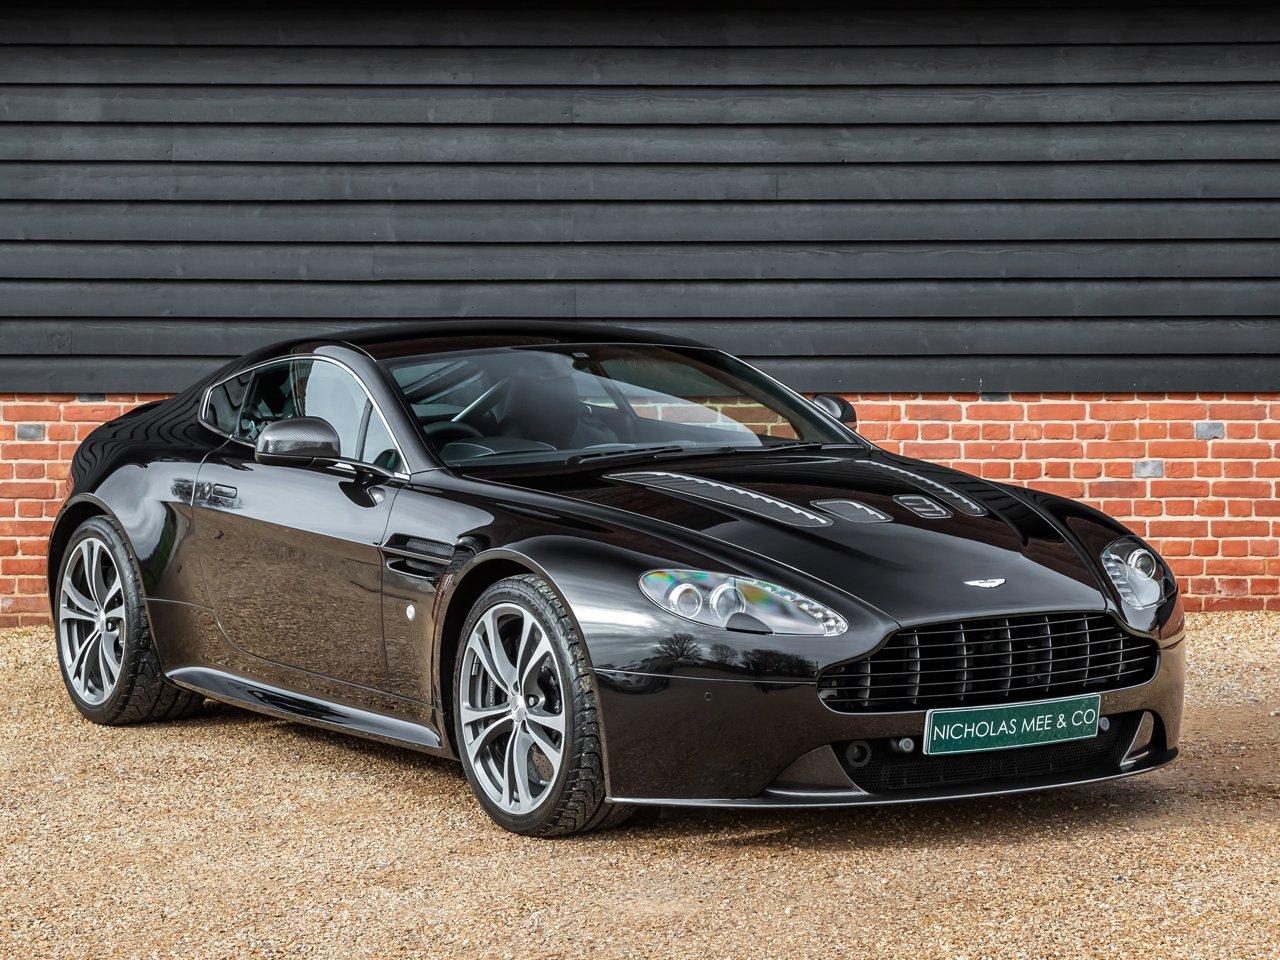 2012 Aston Martin V12 Vantage Classic Driver Market